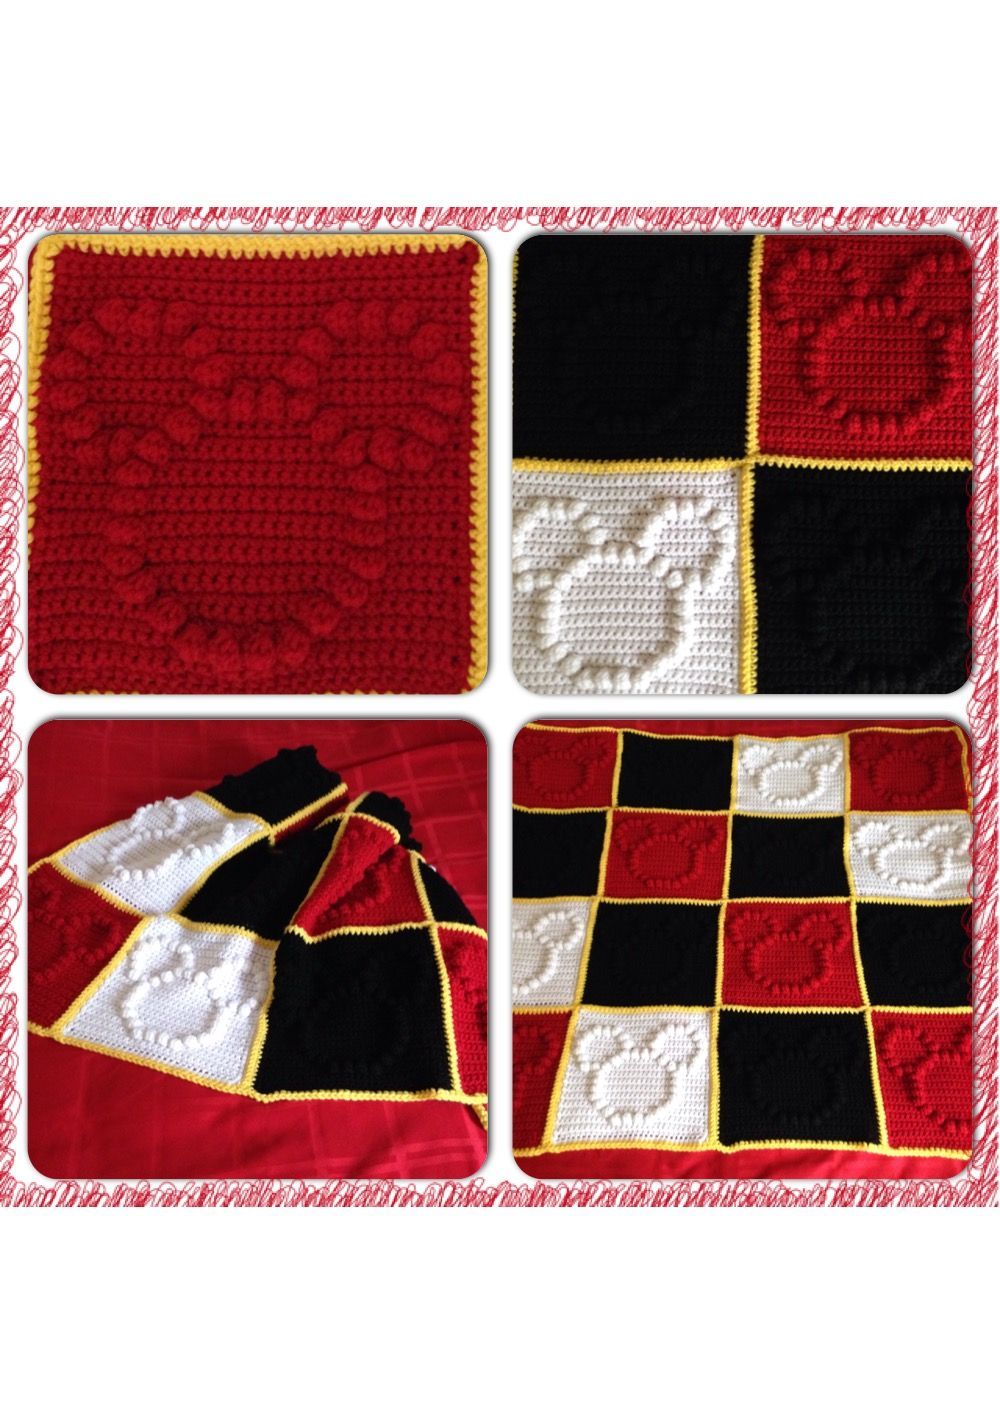 Mickey mouse crochet blanket crochet baby blanket mickey mouse crochet blanket bankloansurffo Choice Image